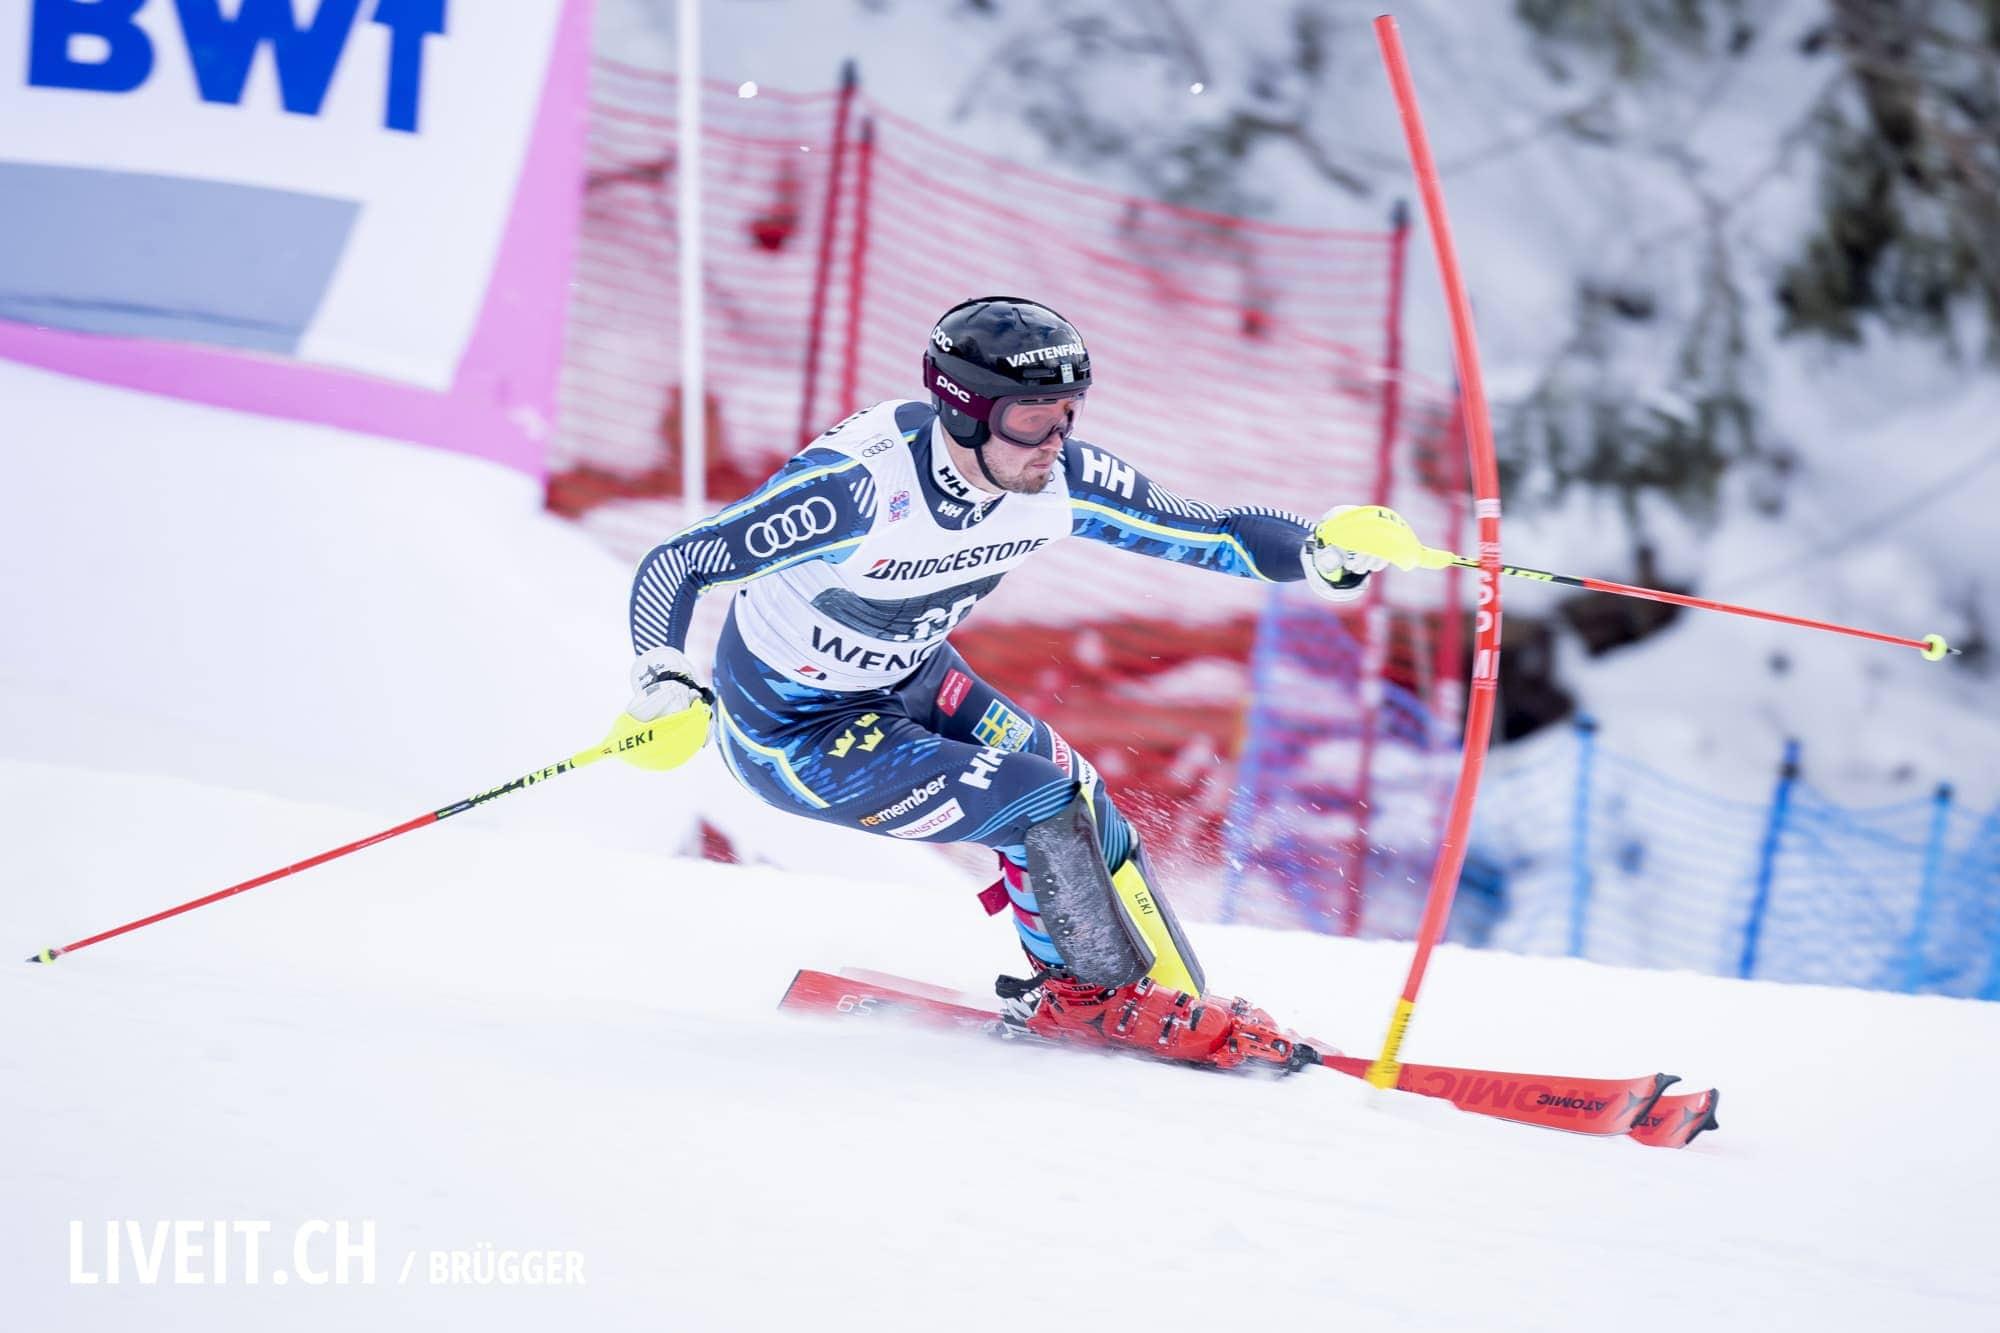 Alexander Koell (SWE) fotografiert am Freitag, 18. Januar 2019 am Lauberhornrennen in der Disziplin: Slalom Alpine Kombination. (Fotografiert von Dominic Bruegger liveit.ch)